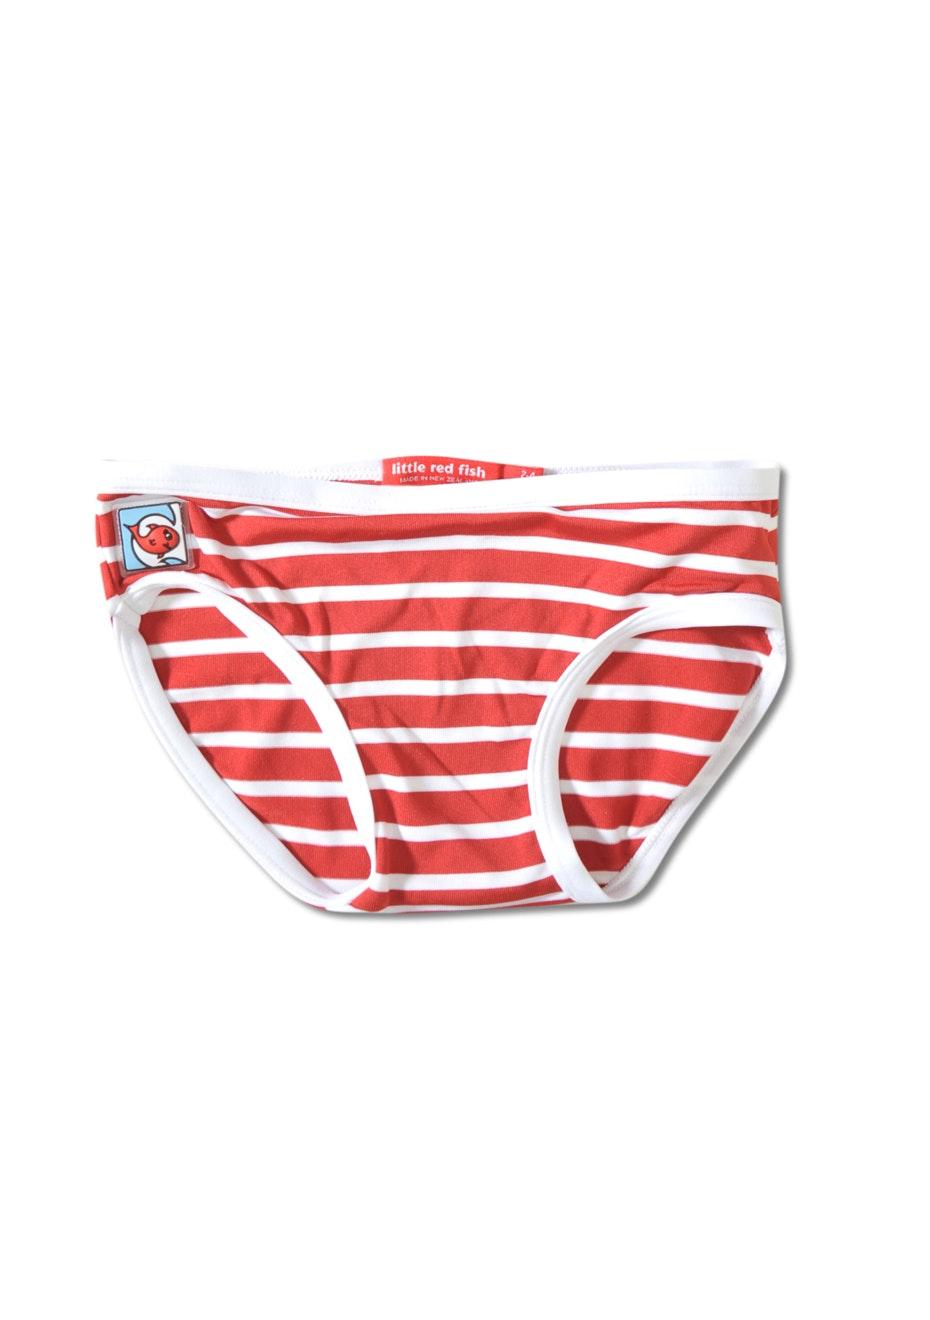 Little Red Fish - Bikini Pants - Red & White